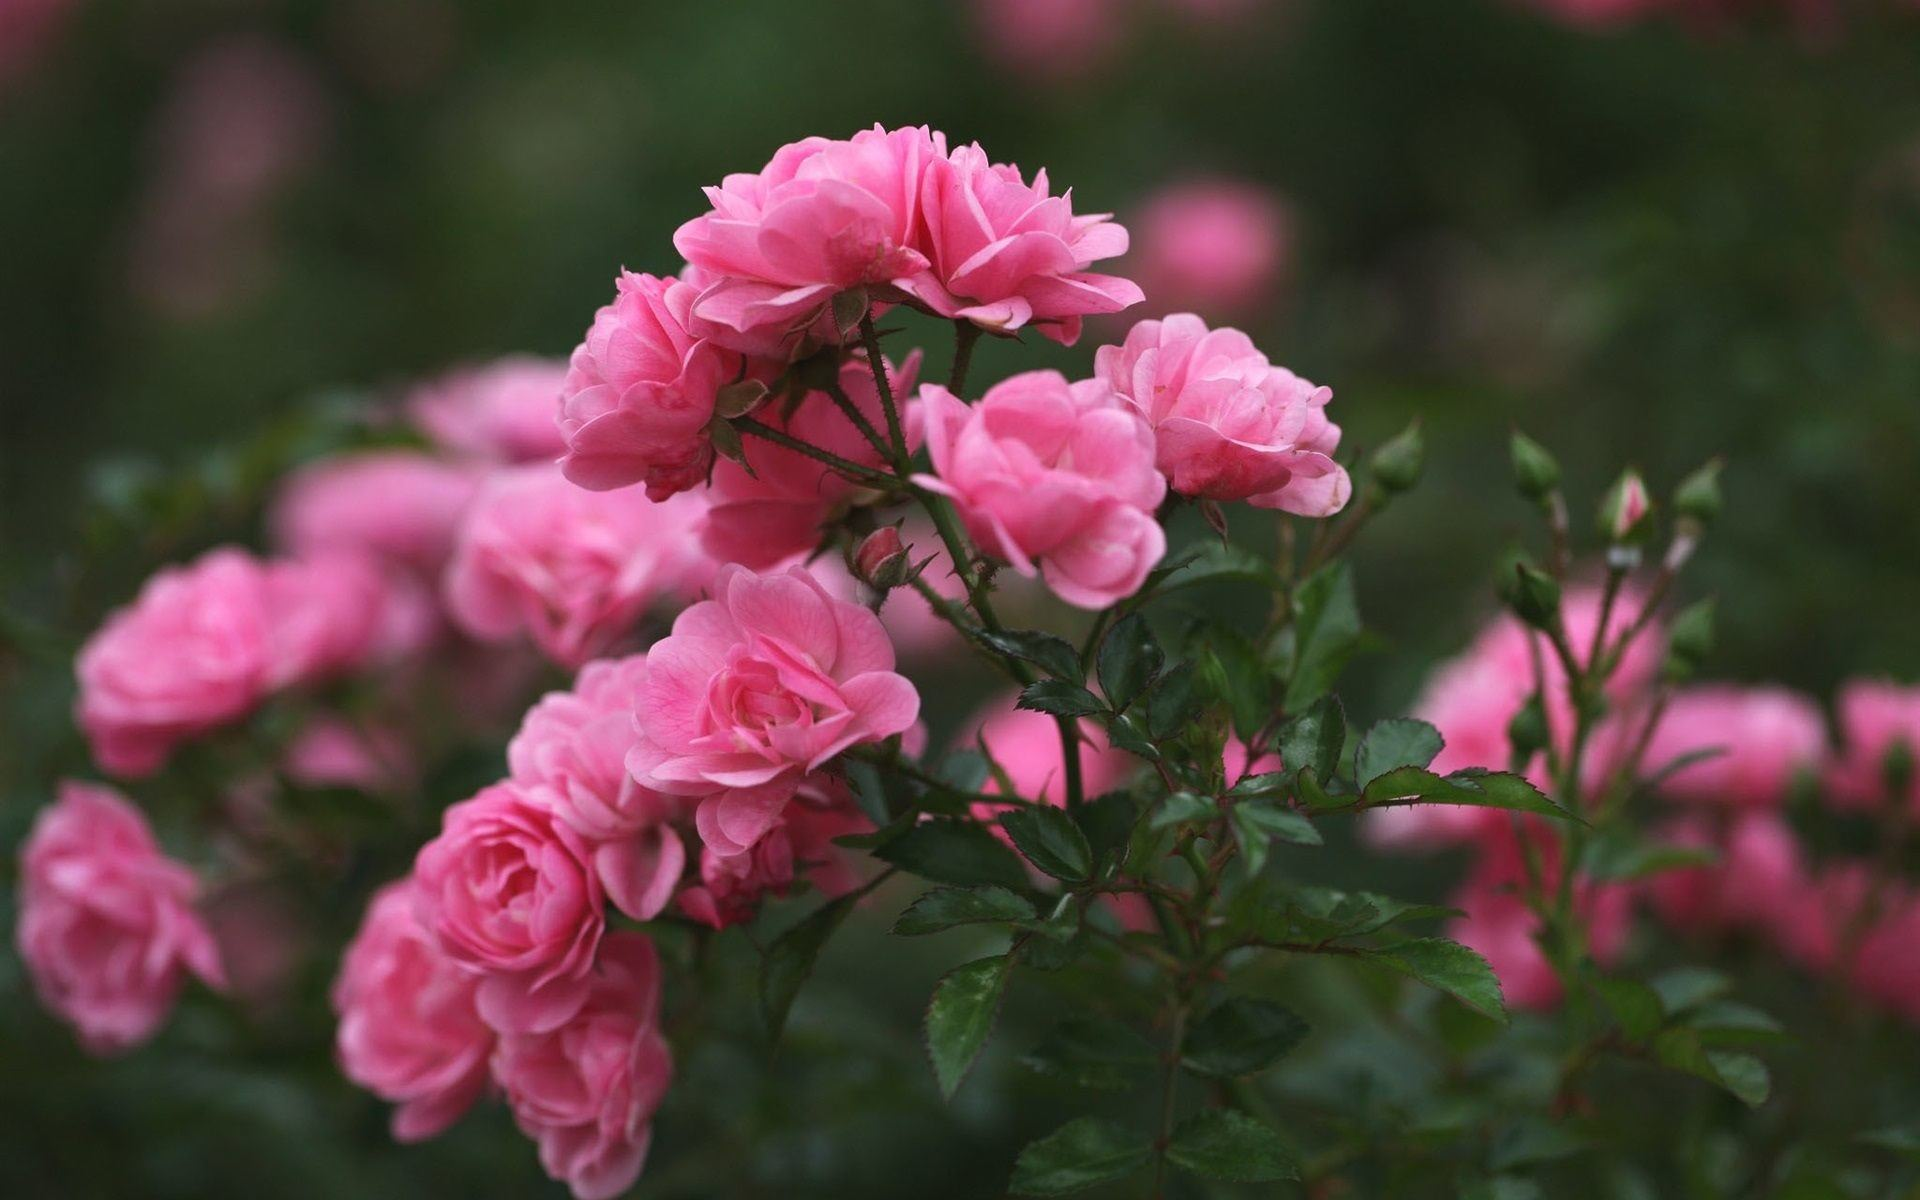 Aesthetic Flower Wallpapers - Top Free Aesthetic Flower ...